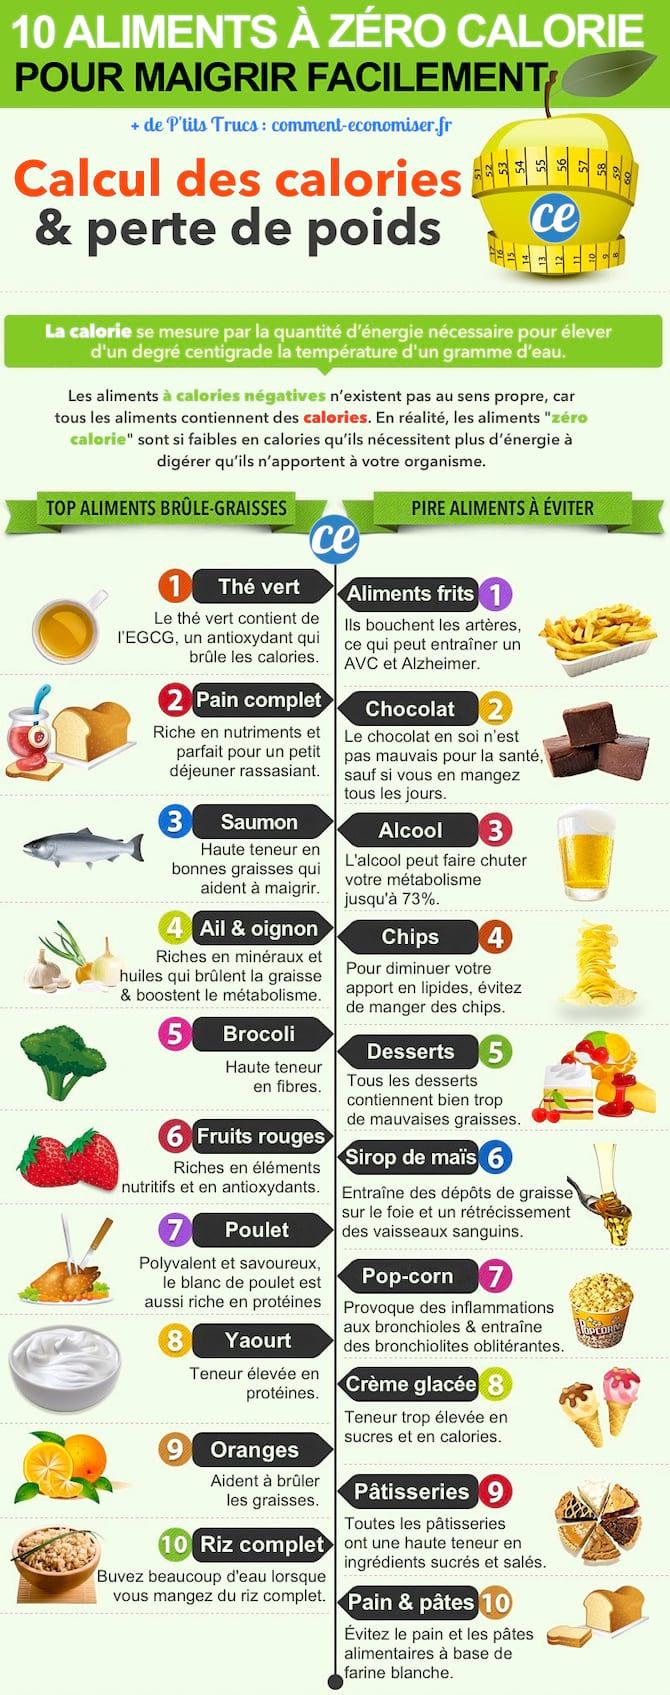 antioxydants de perte de graisse